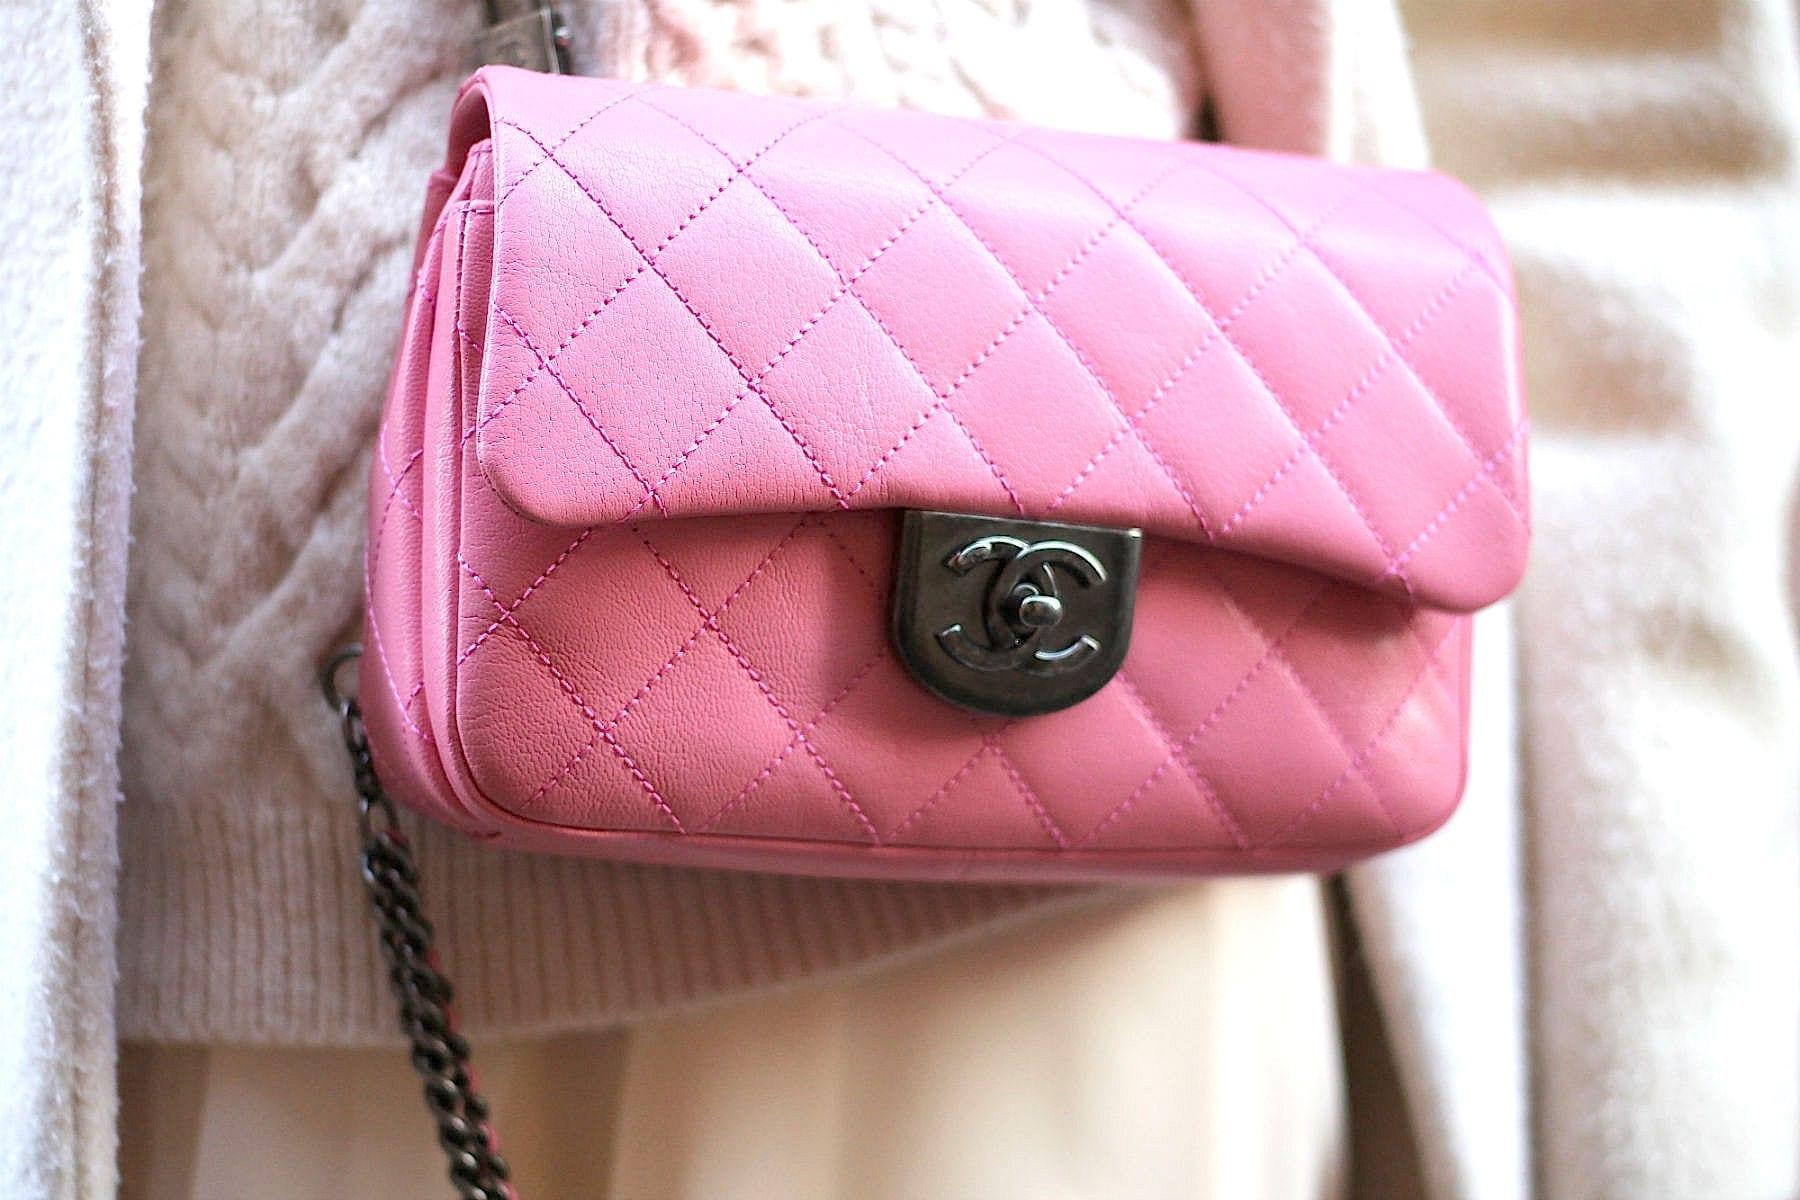 theladycracy.it, elisa bellino, chanel cruise 2016, chanel pink bag, fashion blogger italiane, fashion blog italia, chanel pink bag